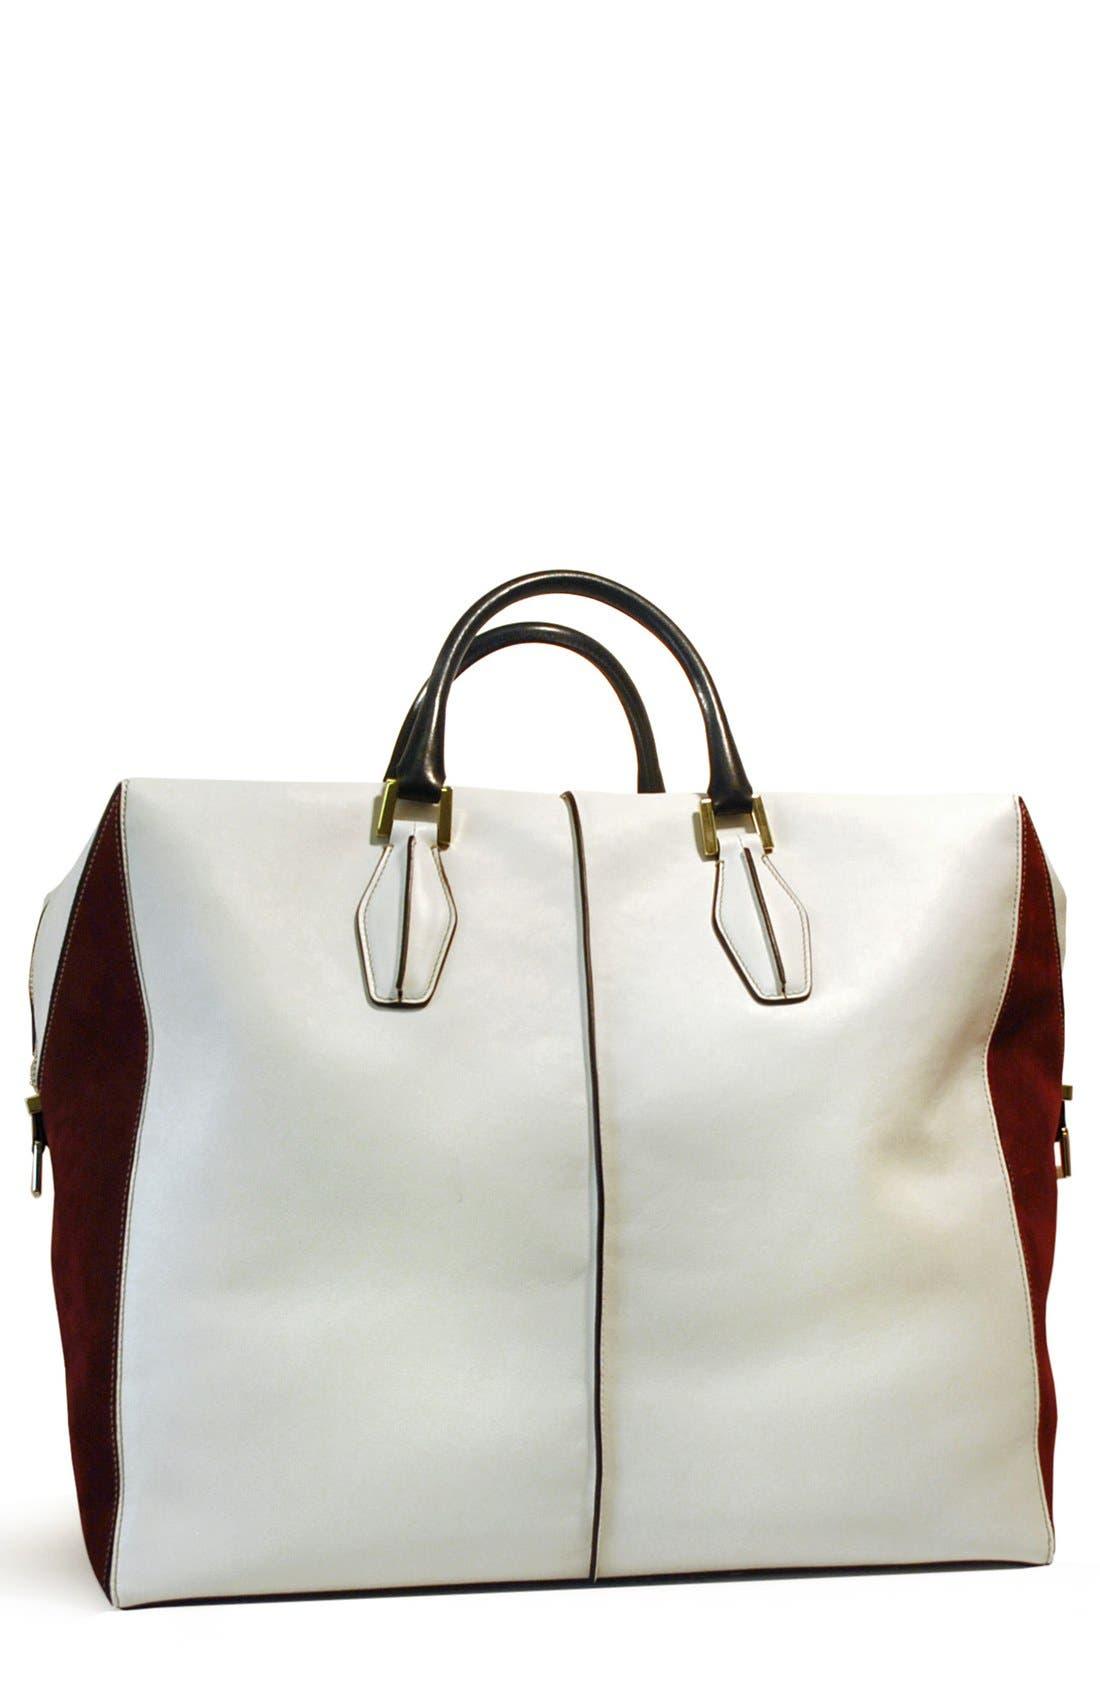 Main Image - Tod's 'D-Cube' Leather Shopper